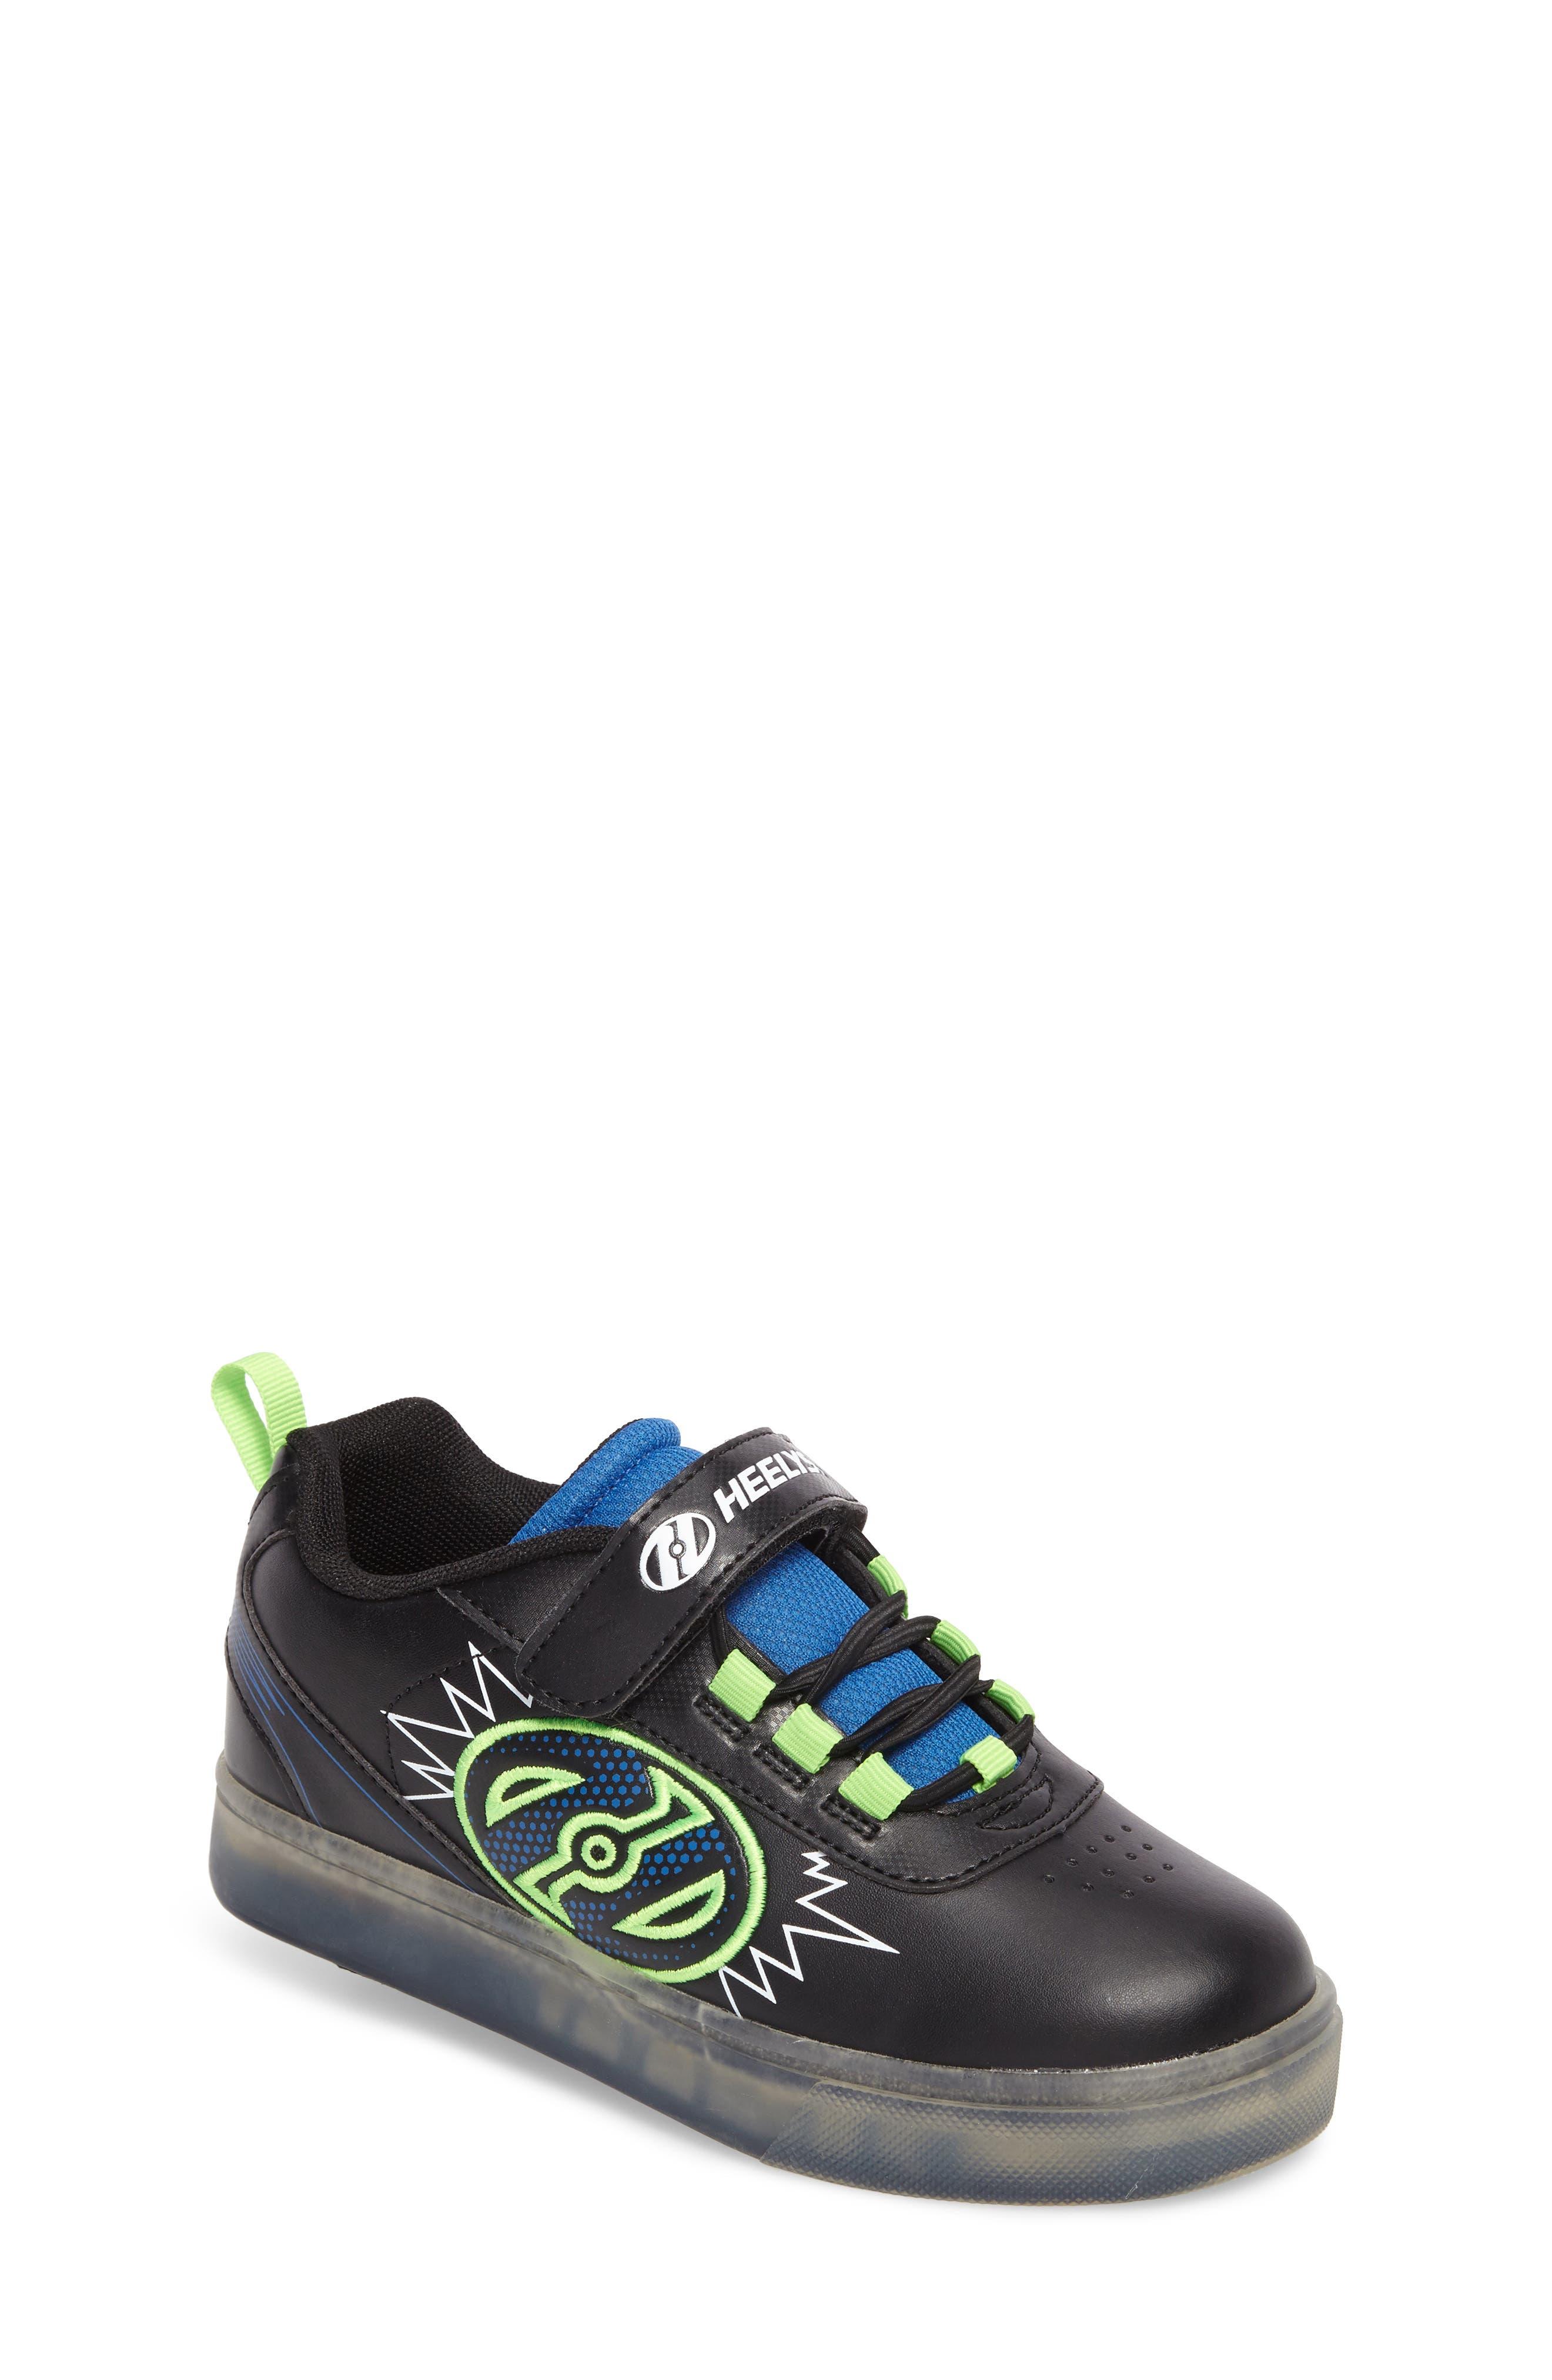 Pow X2 Light-Up Wheeled Skate Sneaker,                             Main thumbnail 1, color,                             Black/ Blue/ Green